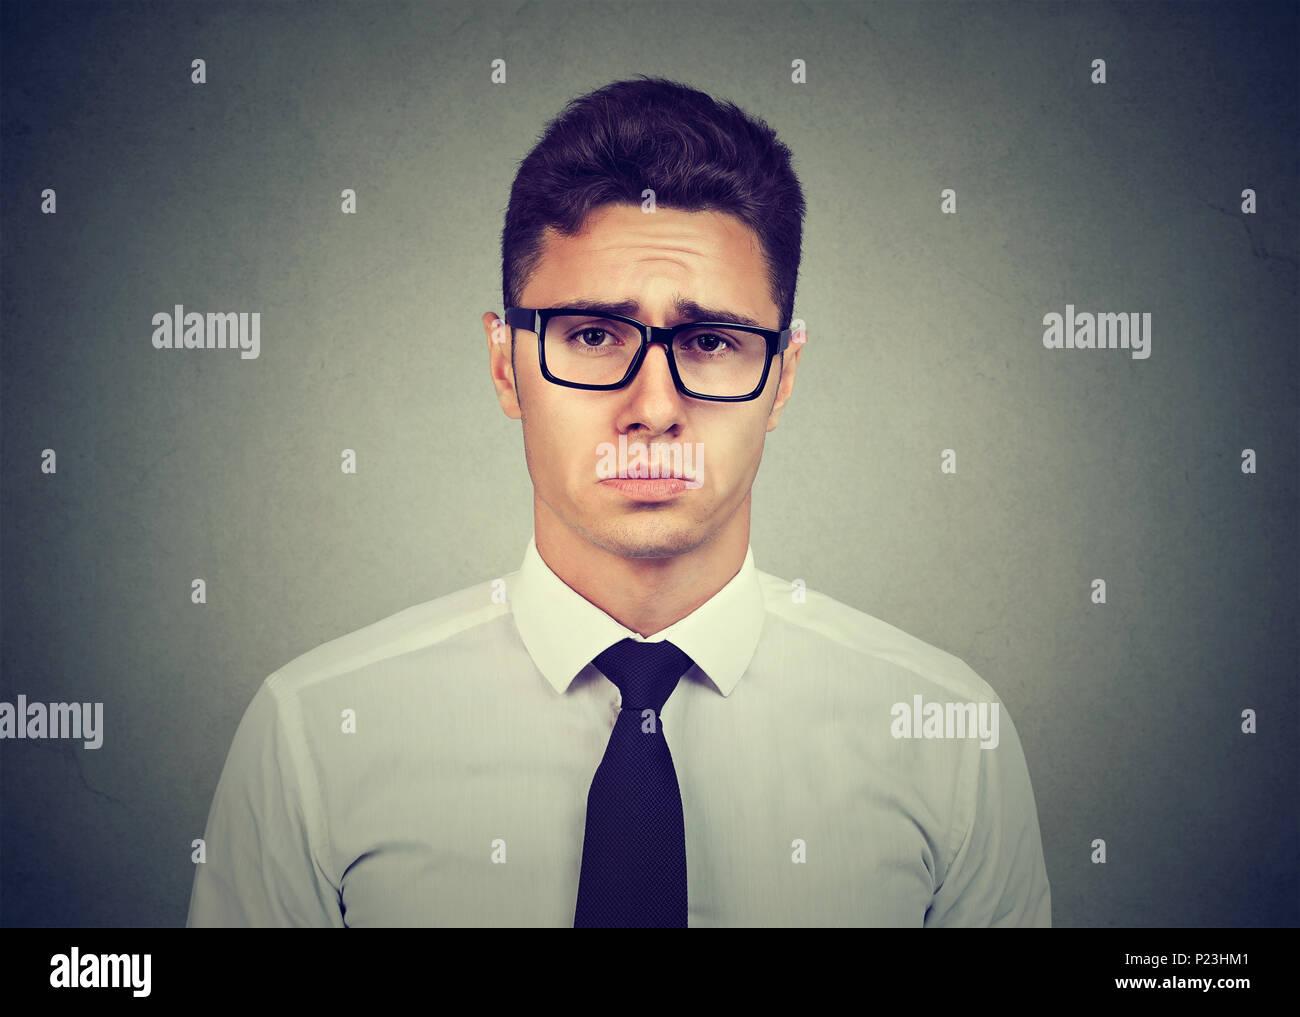 Triste lástima busca joven hombre de negocios Imagen De Stock